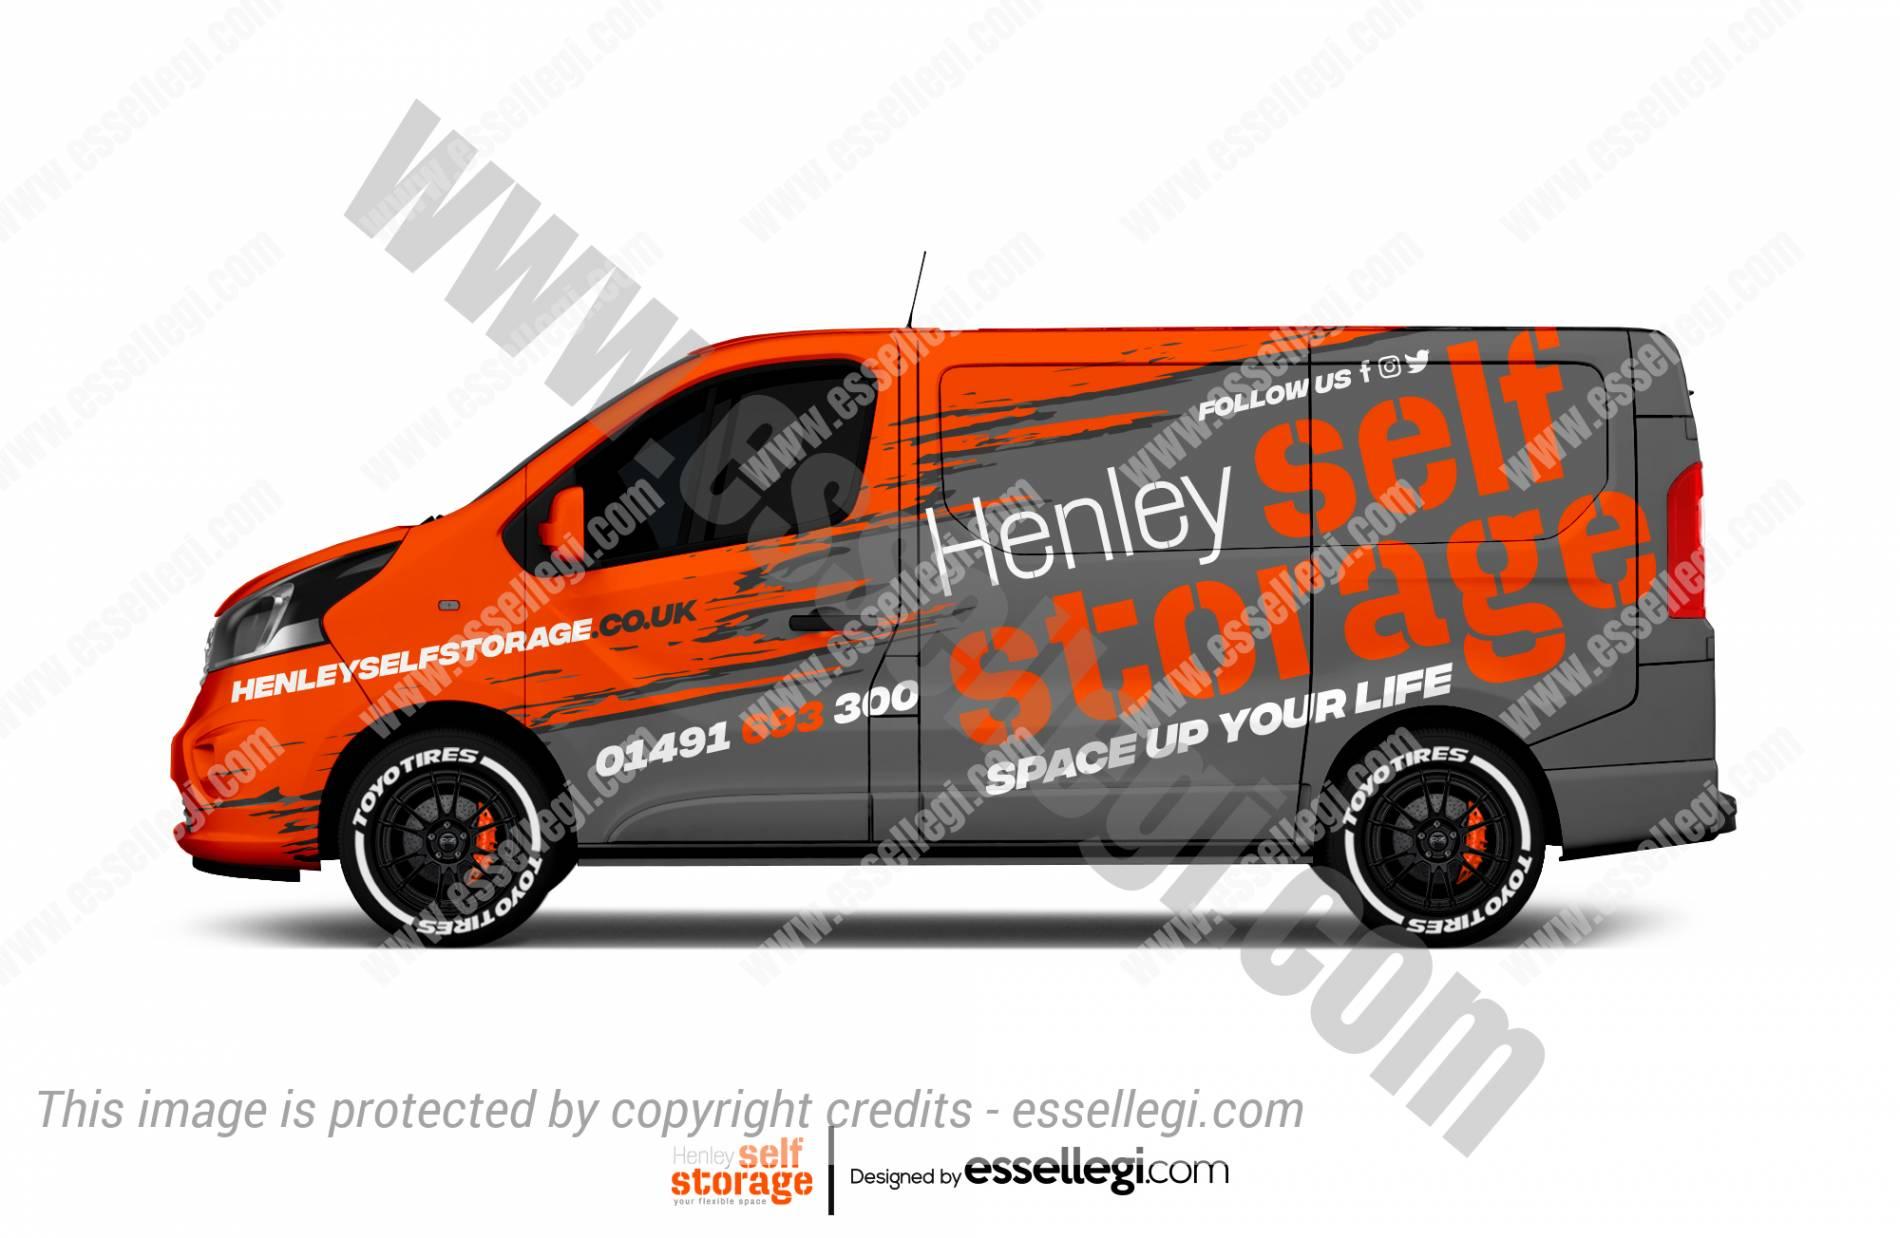 HENLEY SELF STORAGE | VAN WRAP DESIGN 🇬🇧